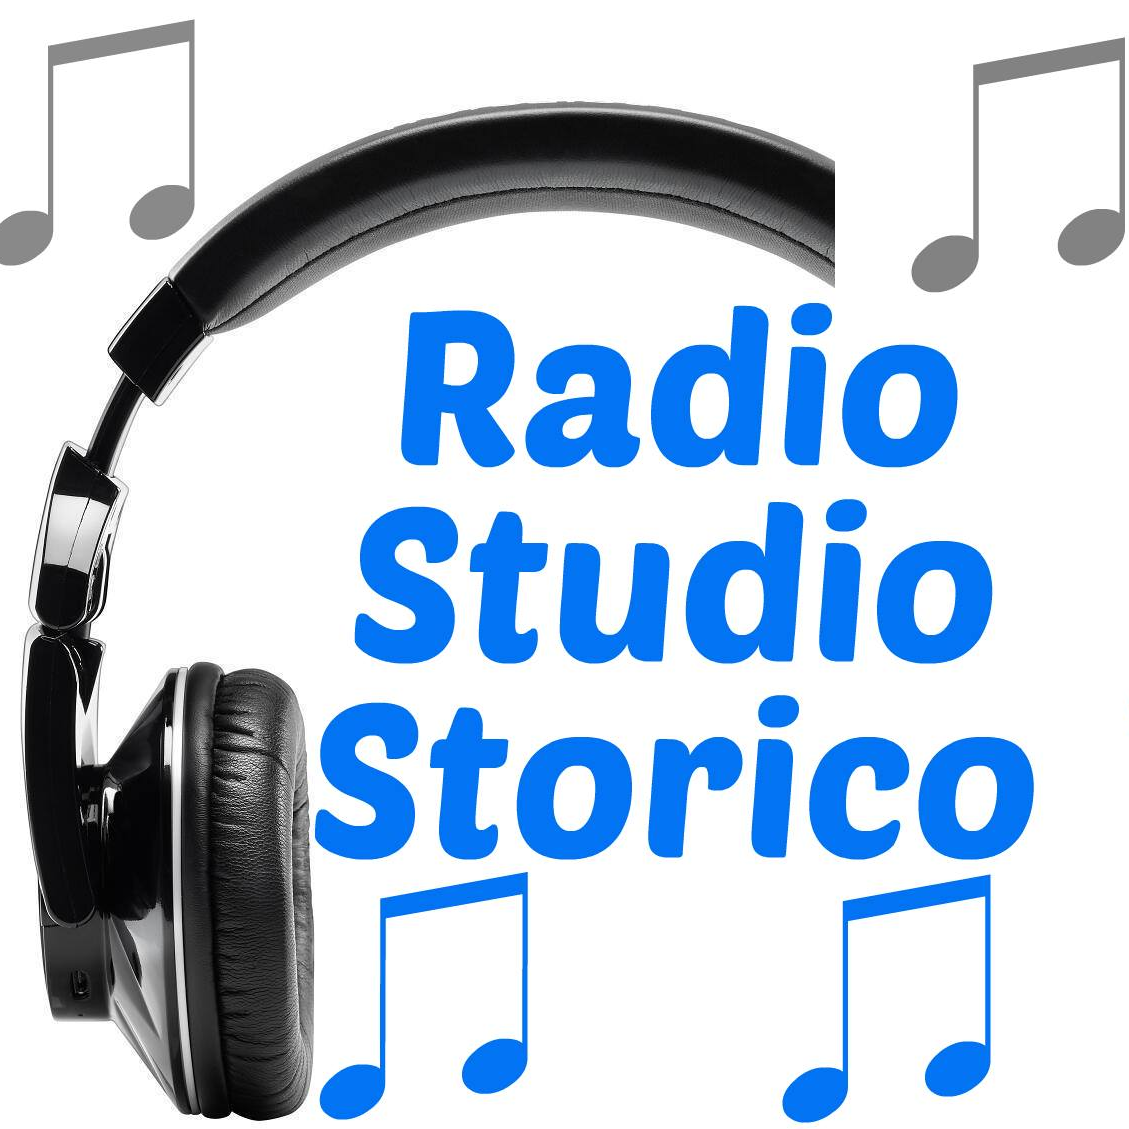 Radio Studio Storico